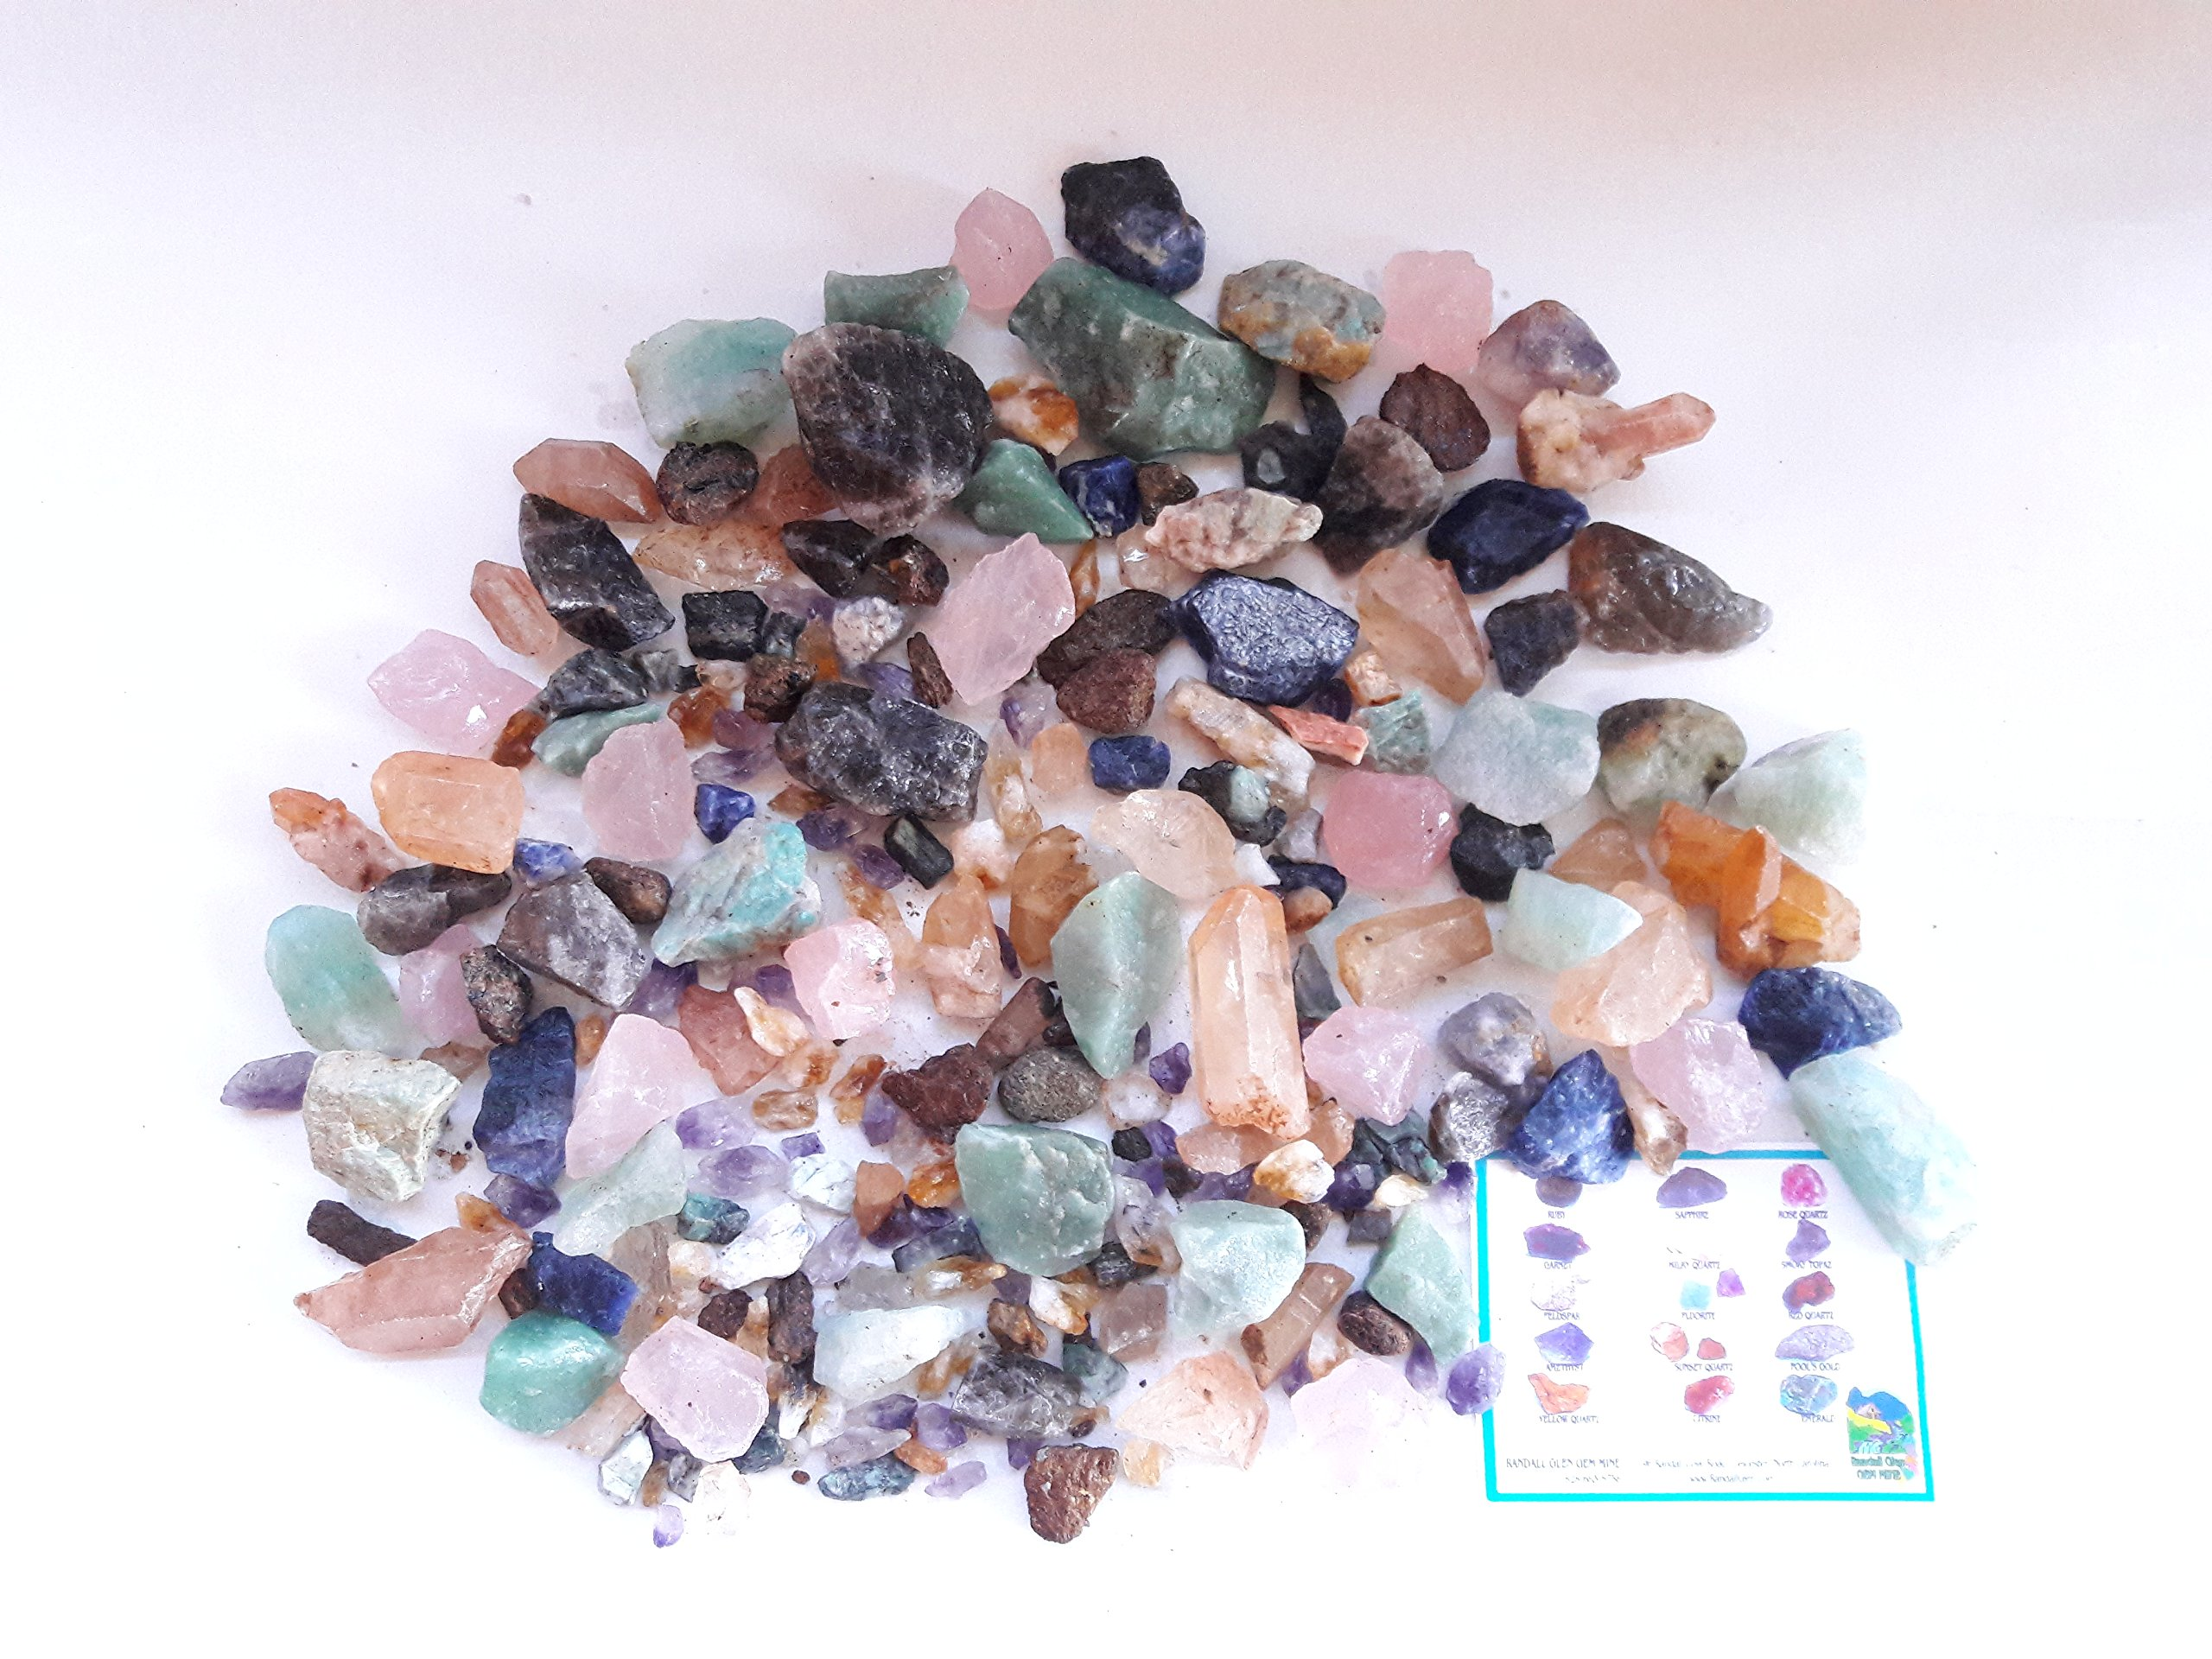 PARTY EXTRAVAGANZA TREASURE BOX Home Gem Mining Kit 22,000+ Carats of Gems